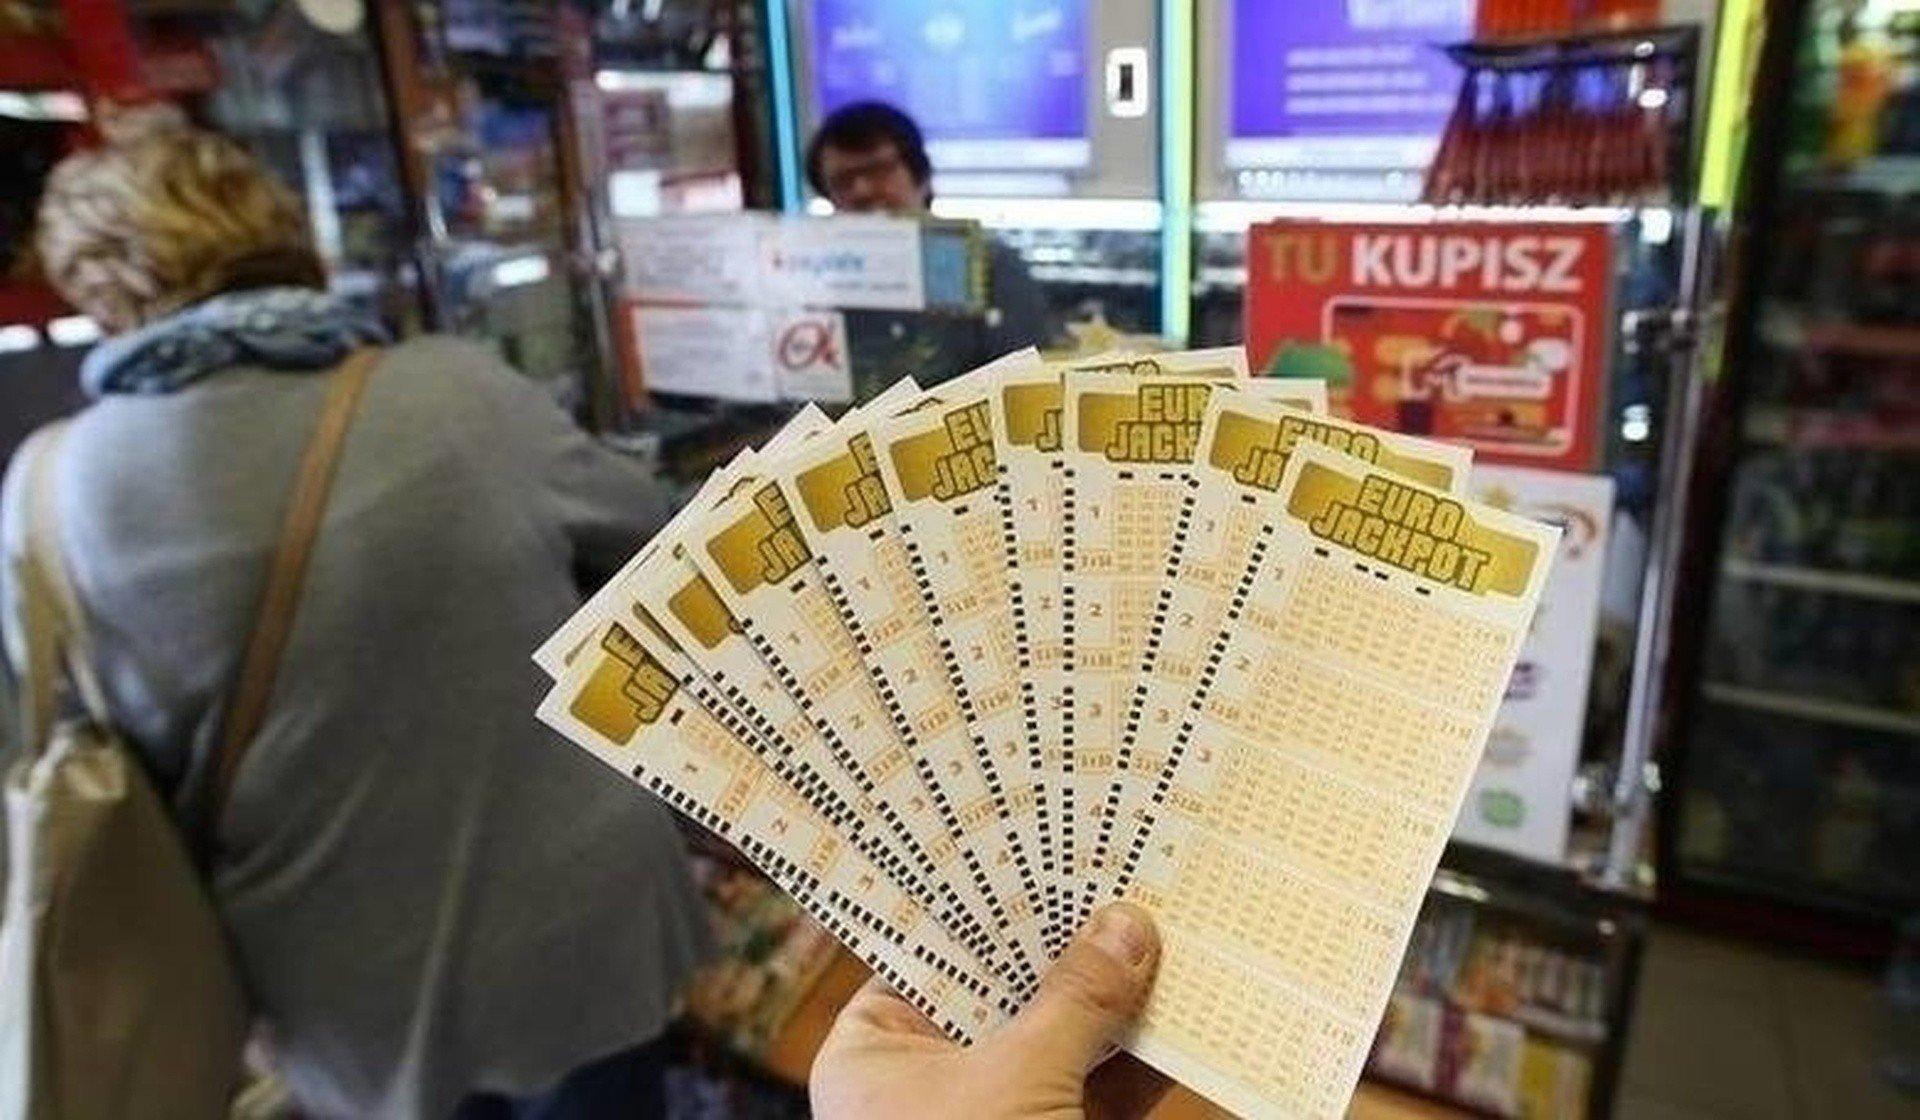 Eurojackpot 10.05.19